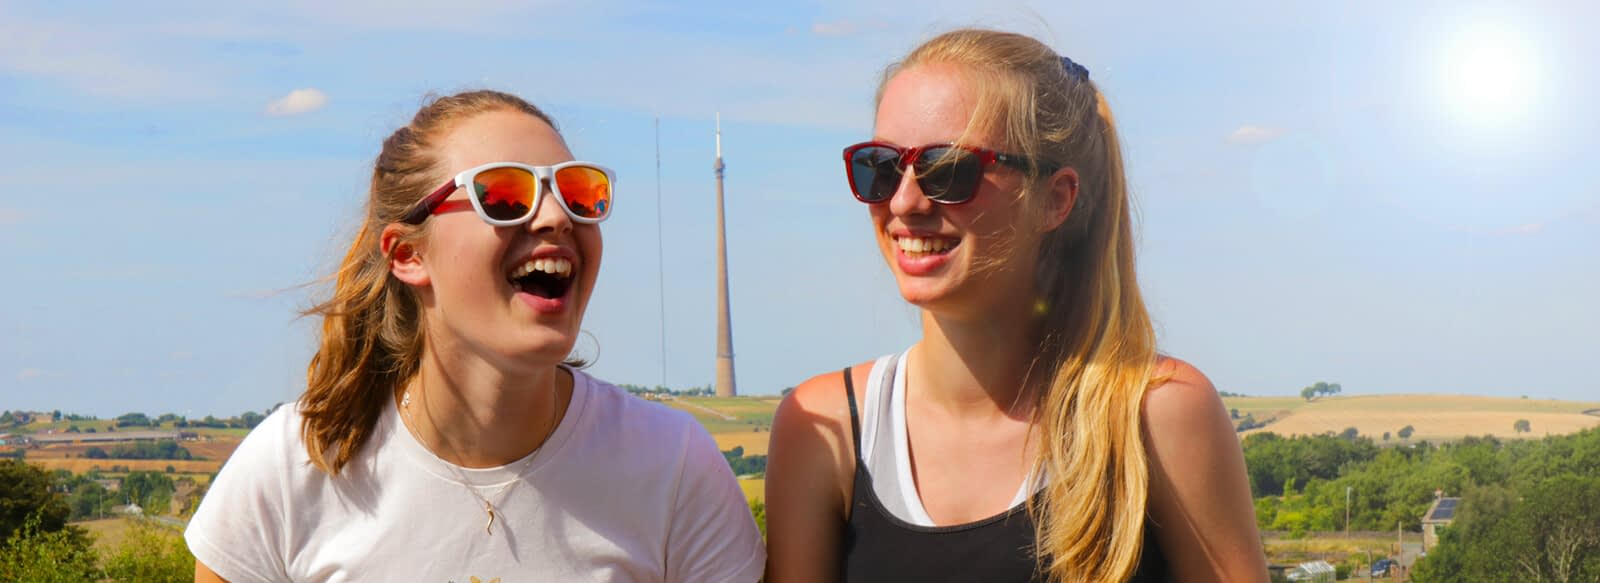 Ridr Switch Sunglasses